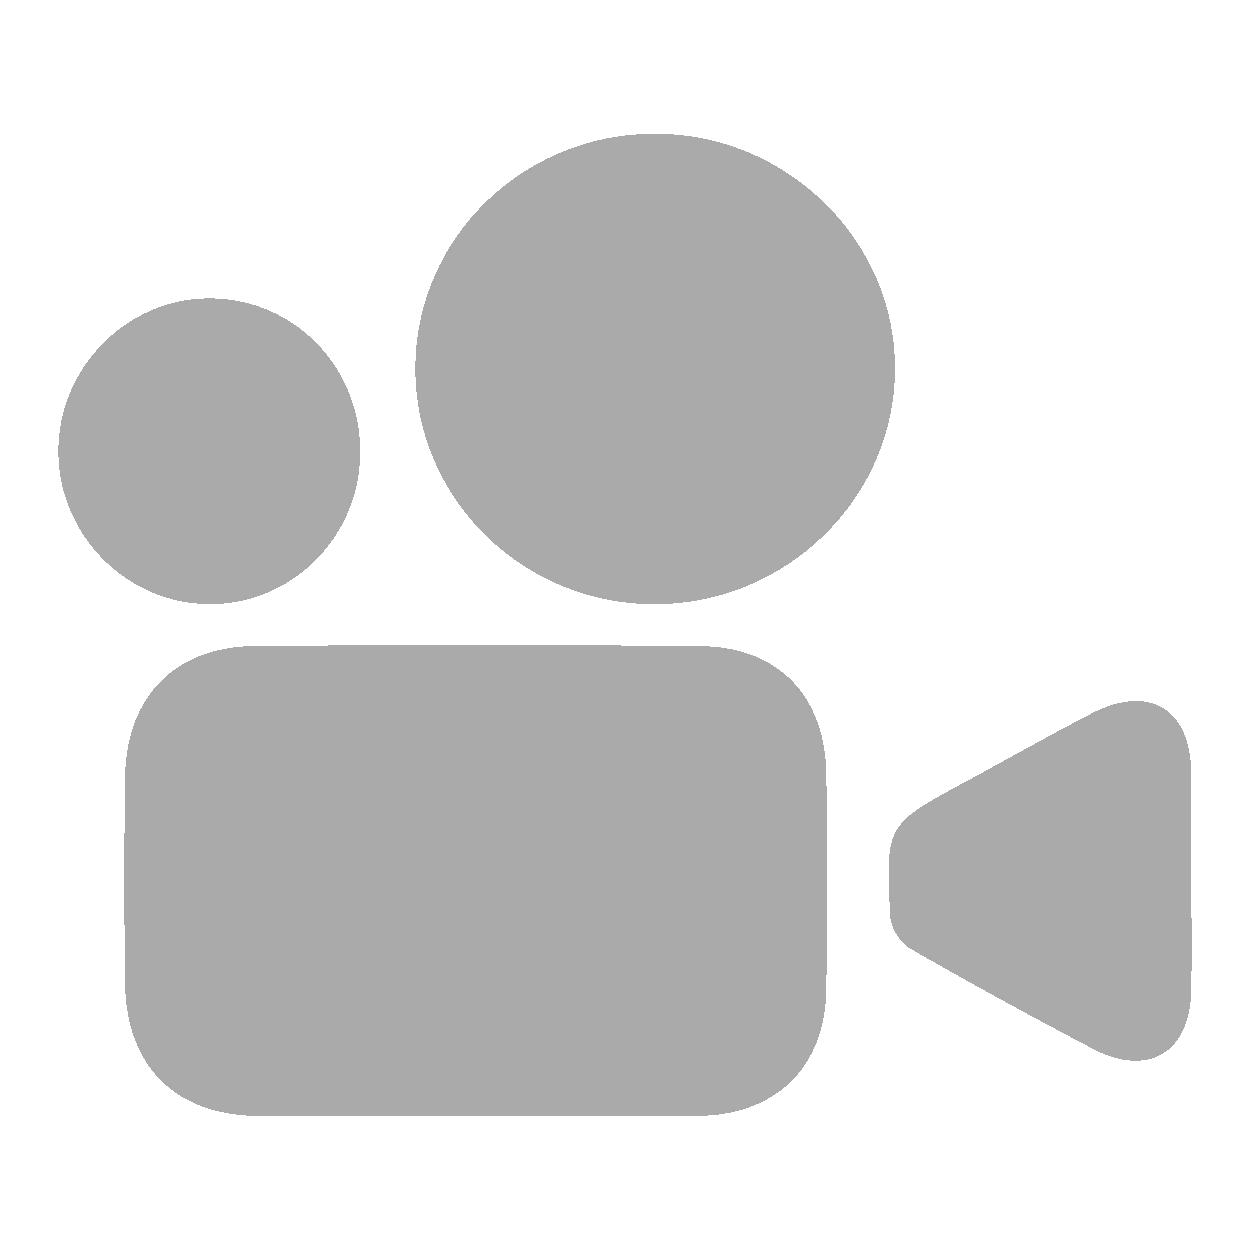 Iconos Sercivios_Audiovisual